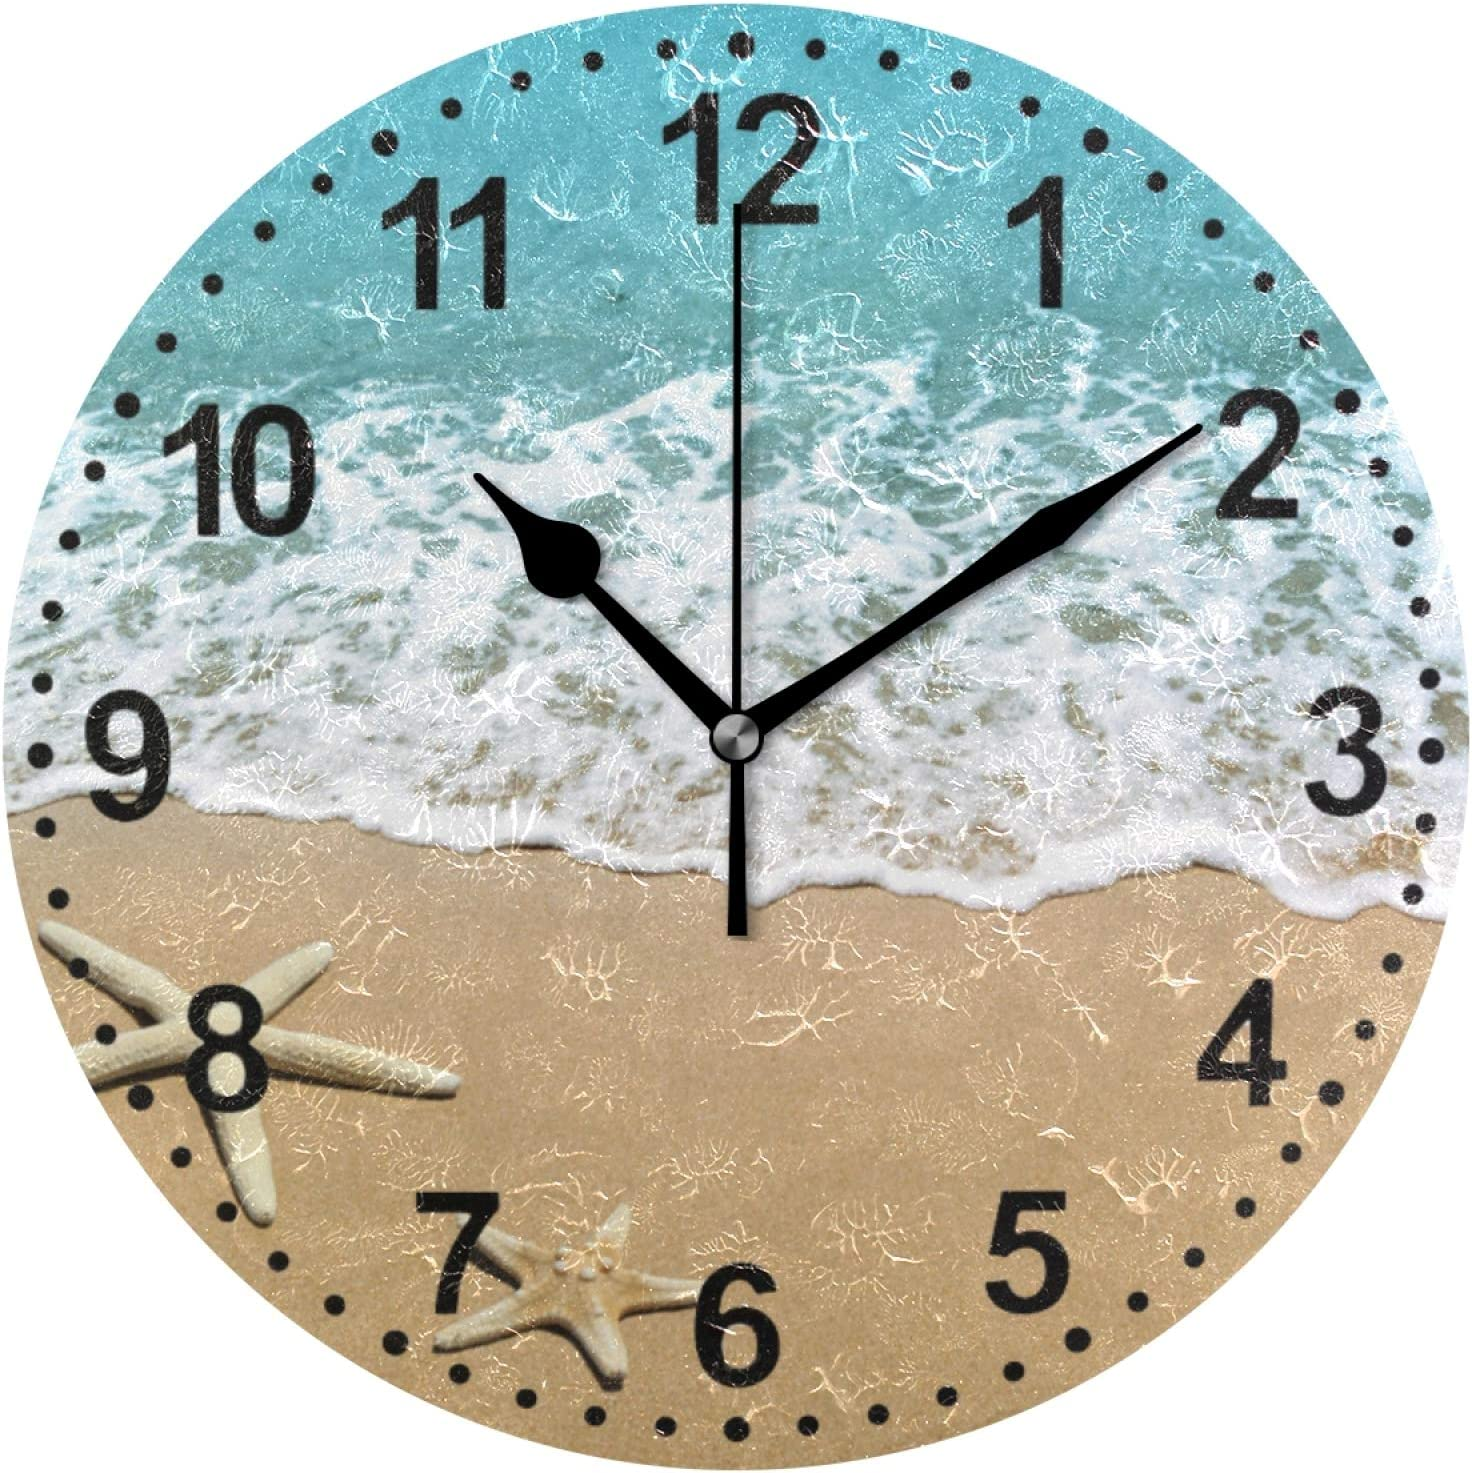 Amazon Com Bathroom Clock Summer Seashell Decorative Wall Clock Non Ticking Silent Clocks For Living Room Decor Mother S Gift Kitchen Dining